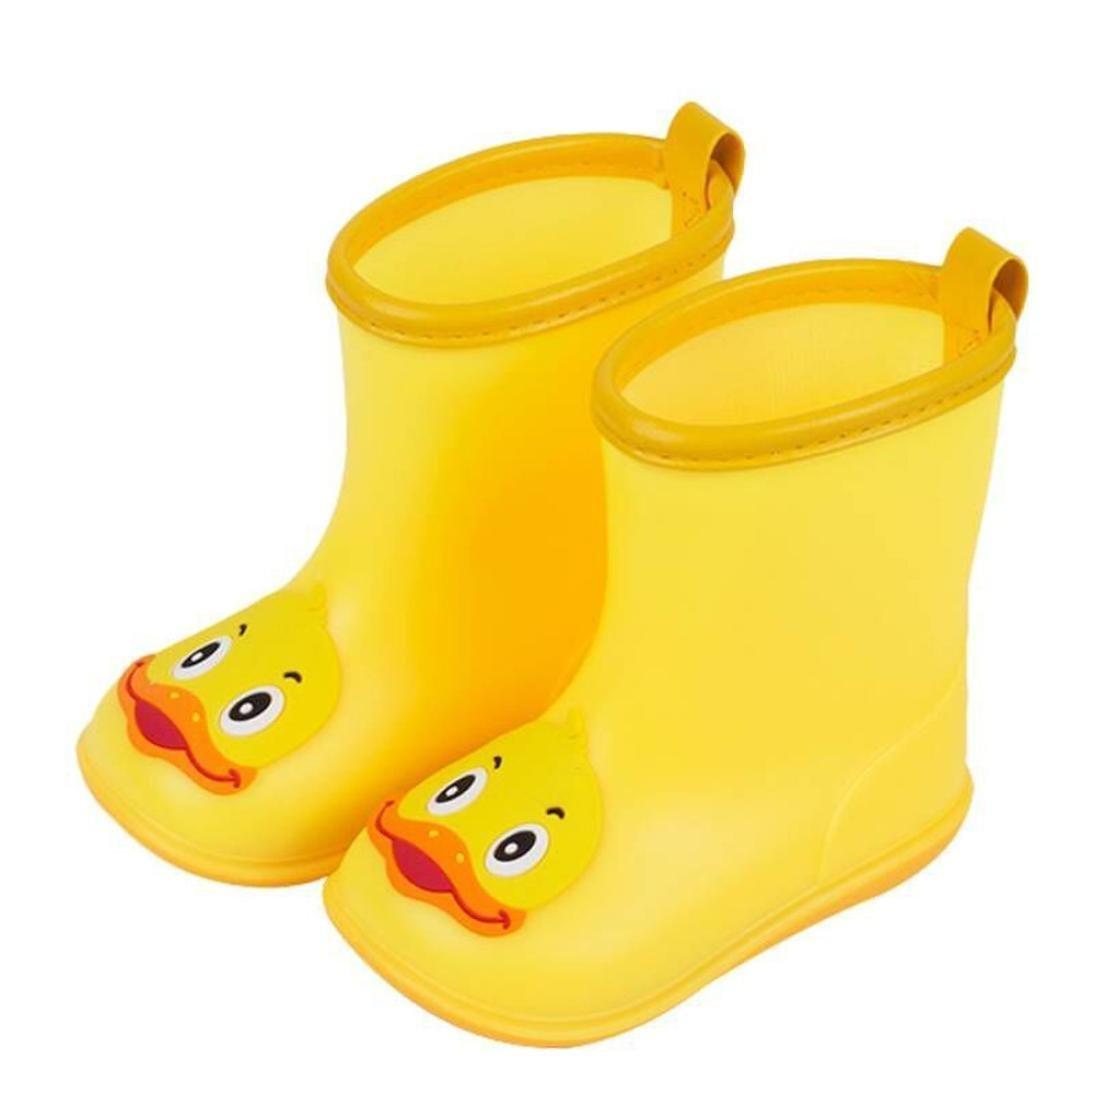 UMFun Infant Kids Rain Shoes Children Baby Cartoon Duck Rubber Waterproof Warm Boots Rain Shoes (US:10.5)